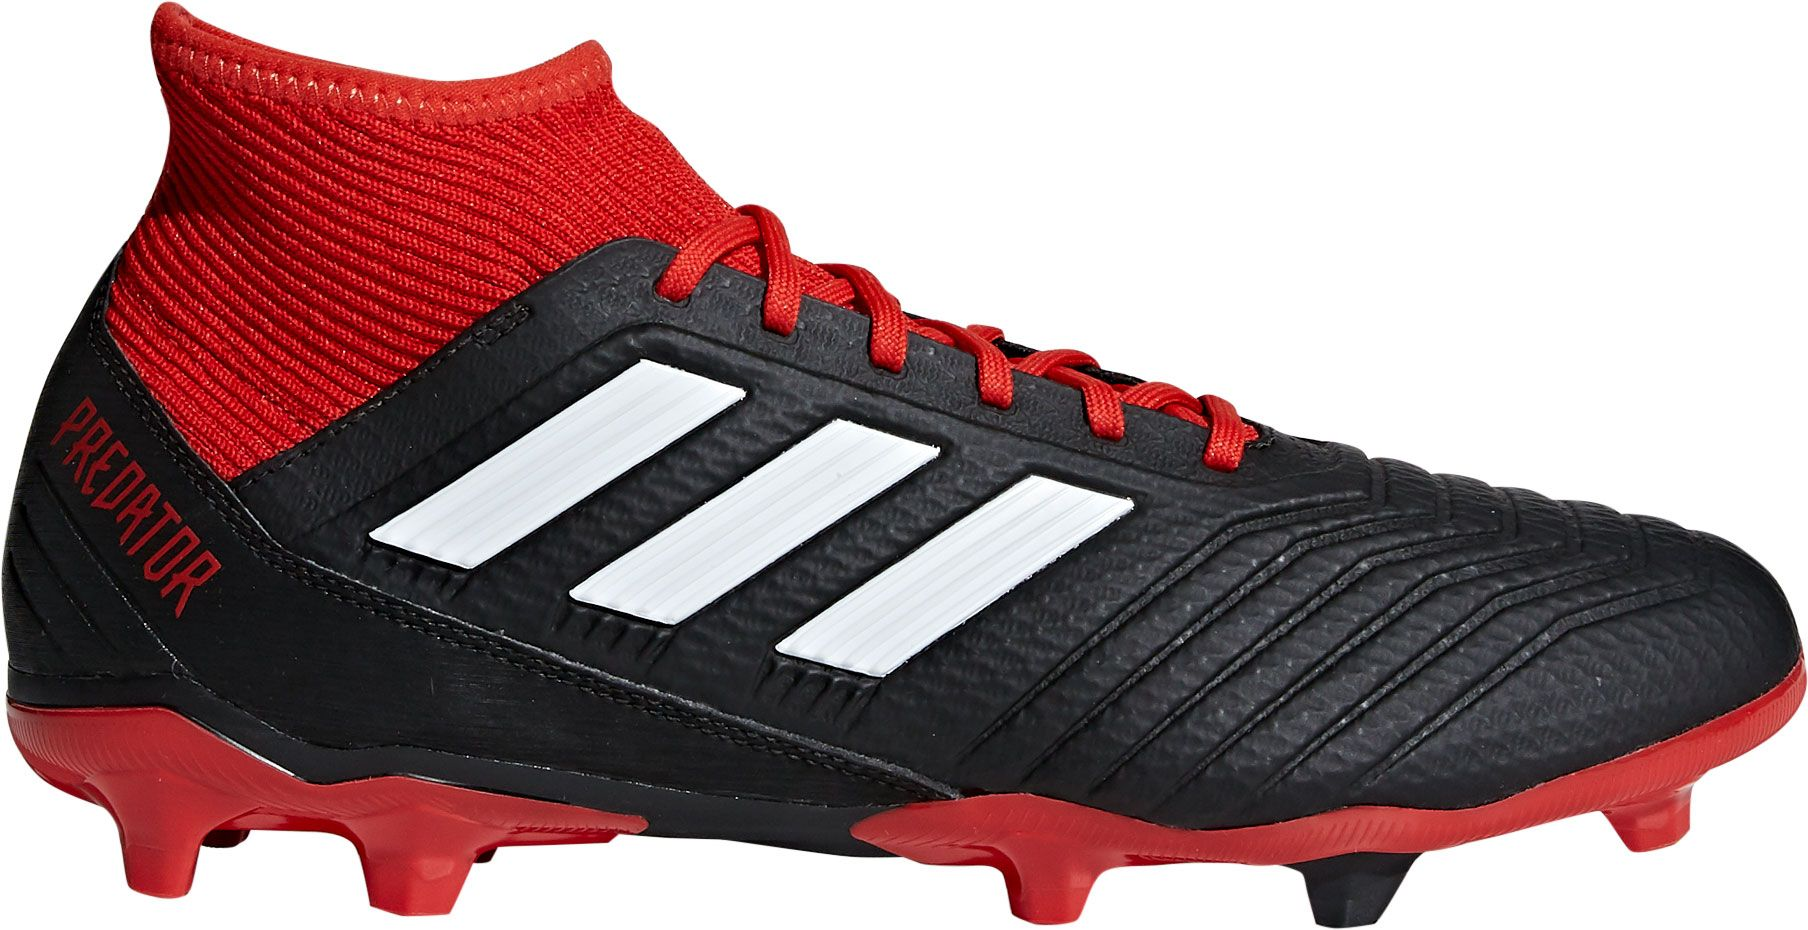 adidas Men's Predator 18.3 FG Soccer Cleats, Size: 7.0, Black